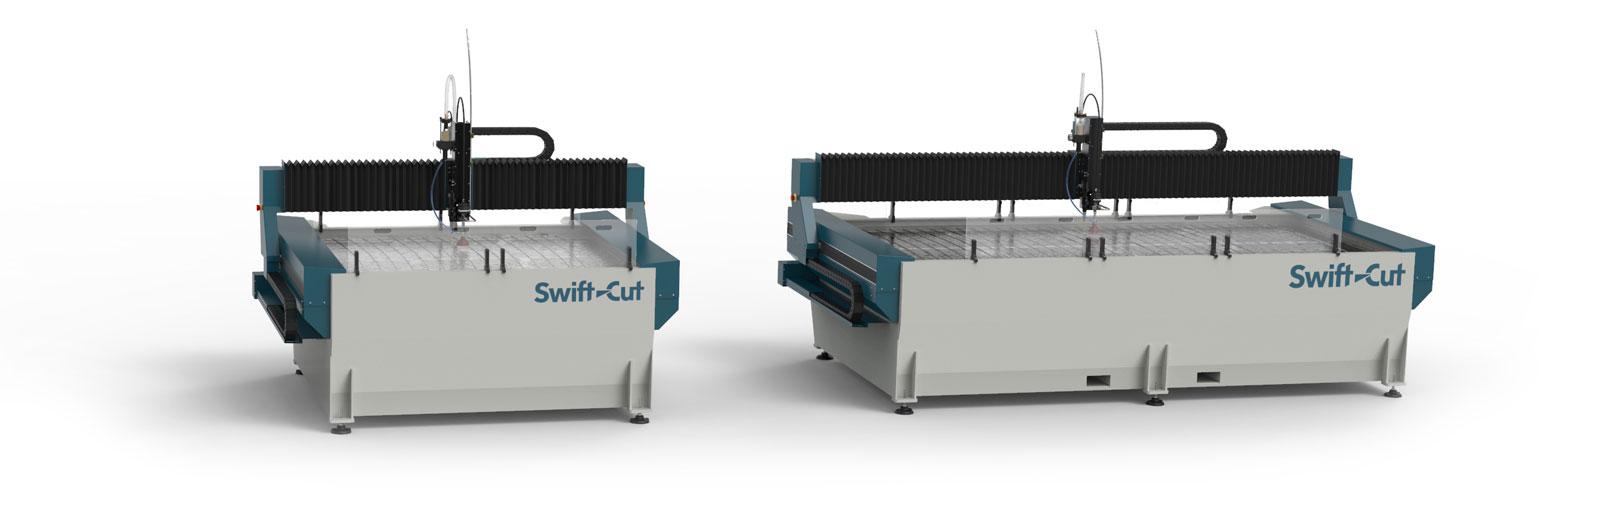 Swift-Jet machines